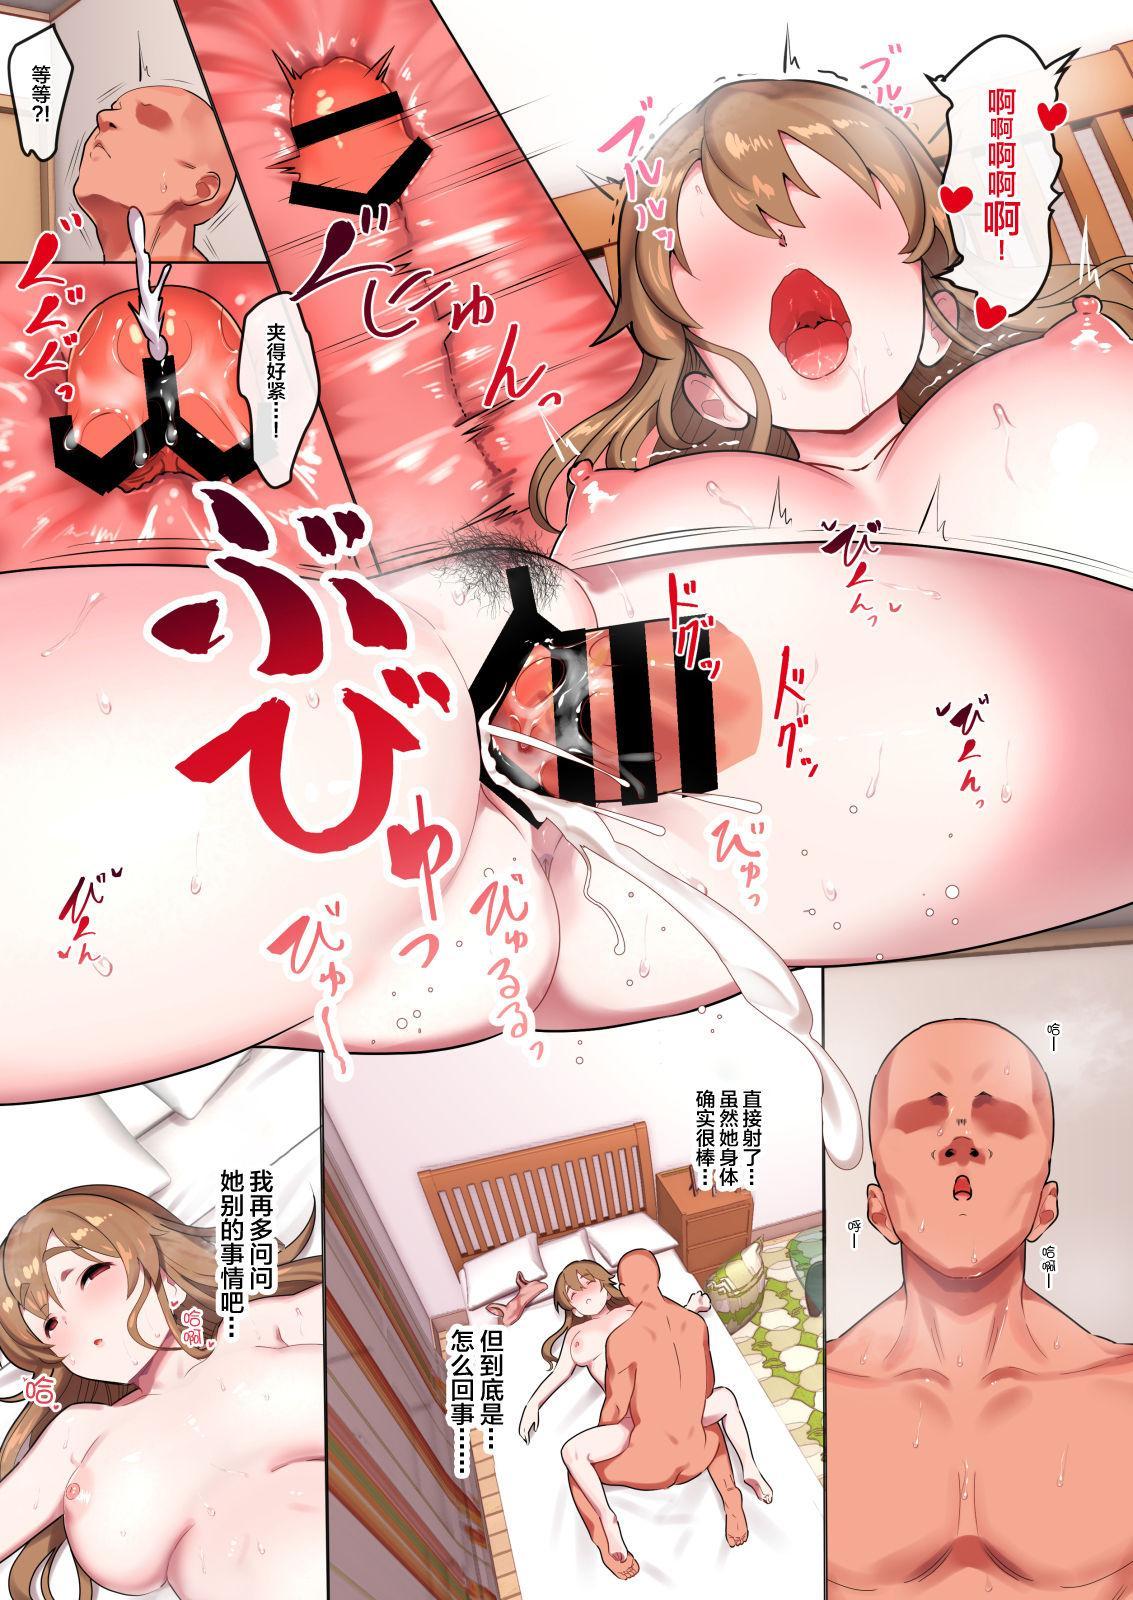 Saimin Ochi Kyonyuu Shimai wa Semen ga Daisuki 5